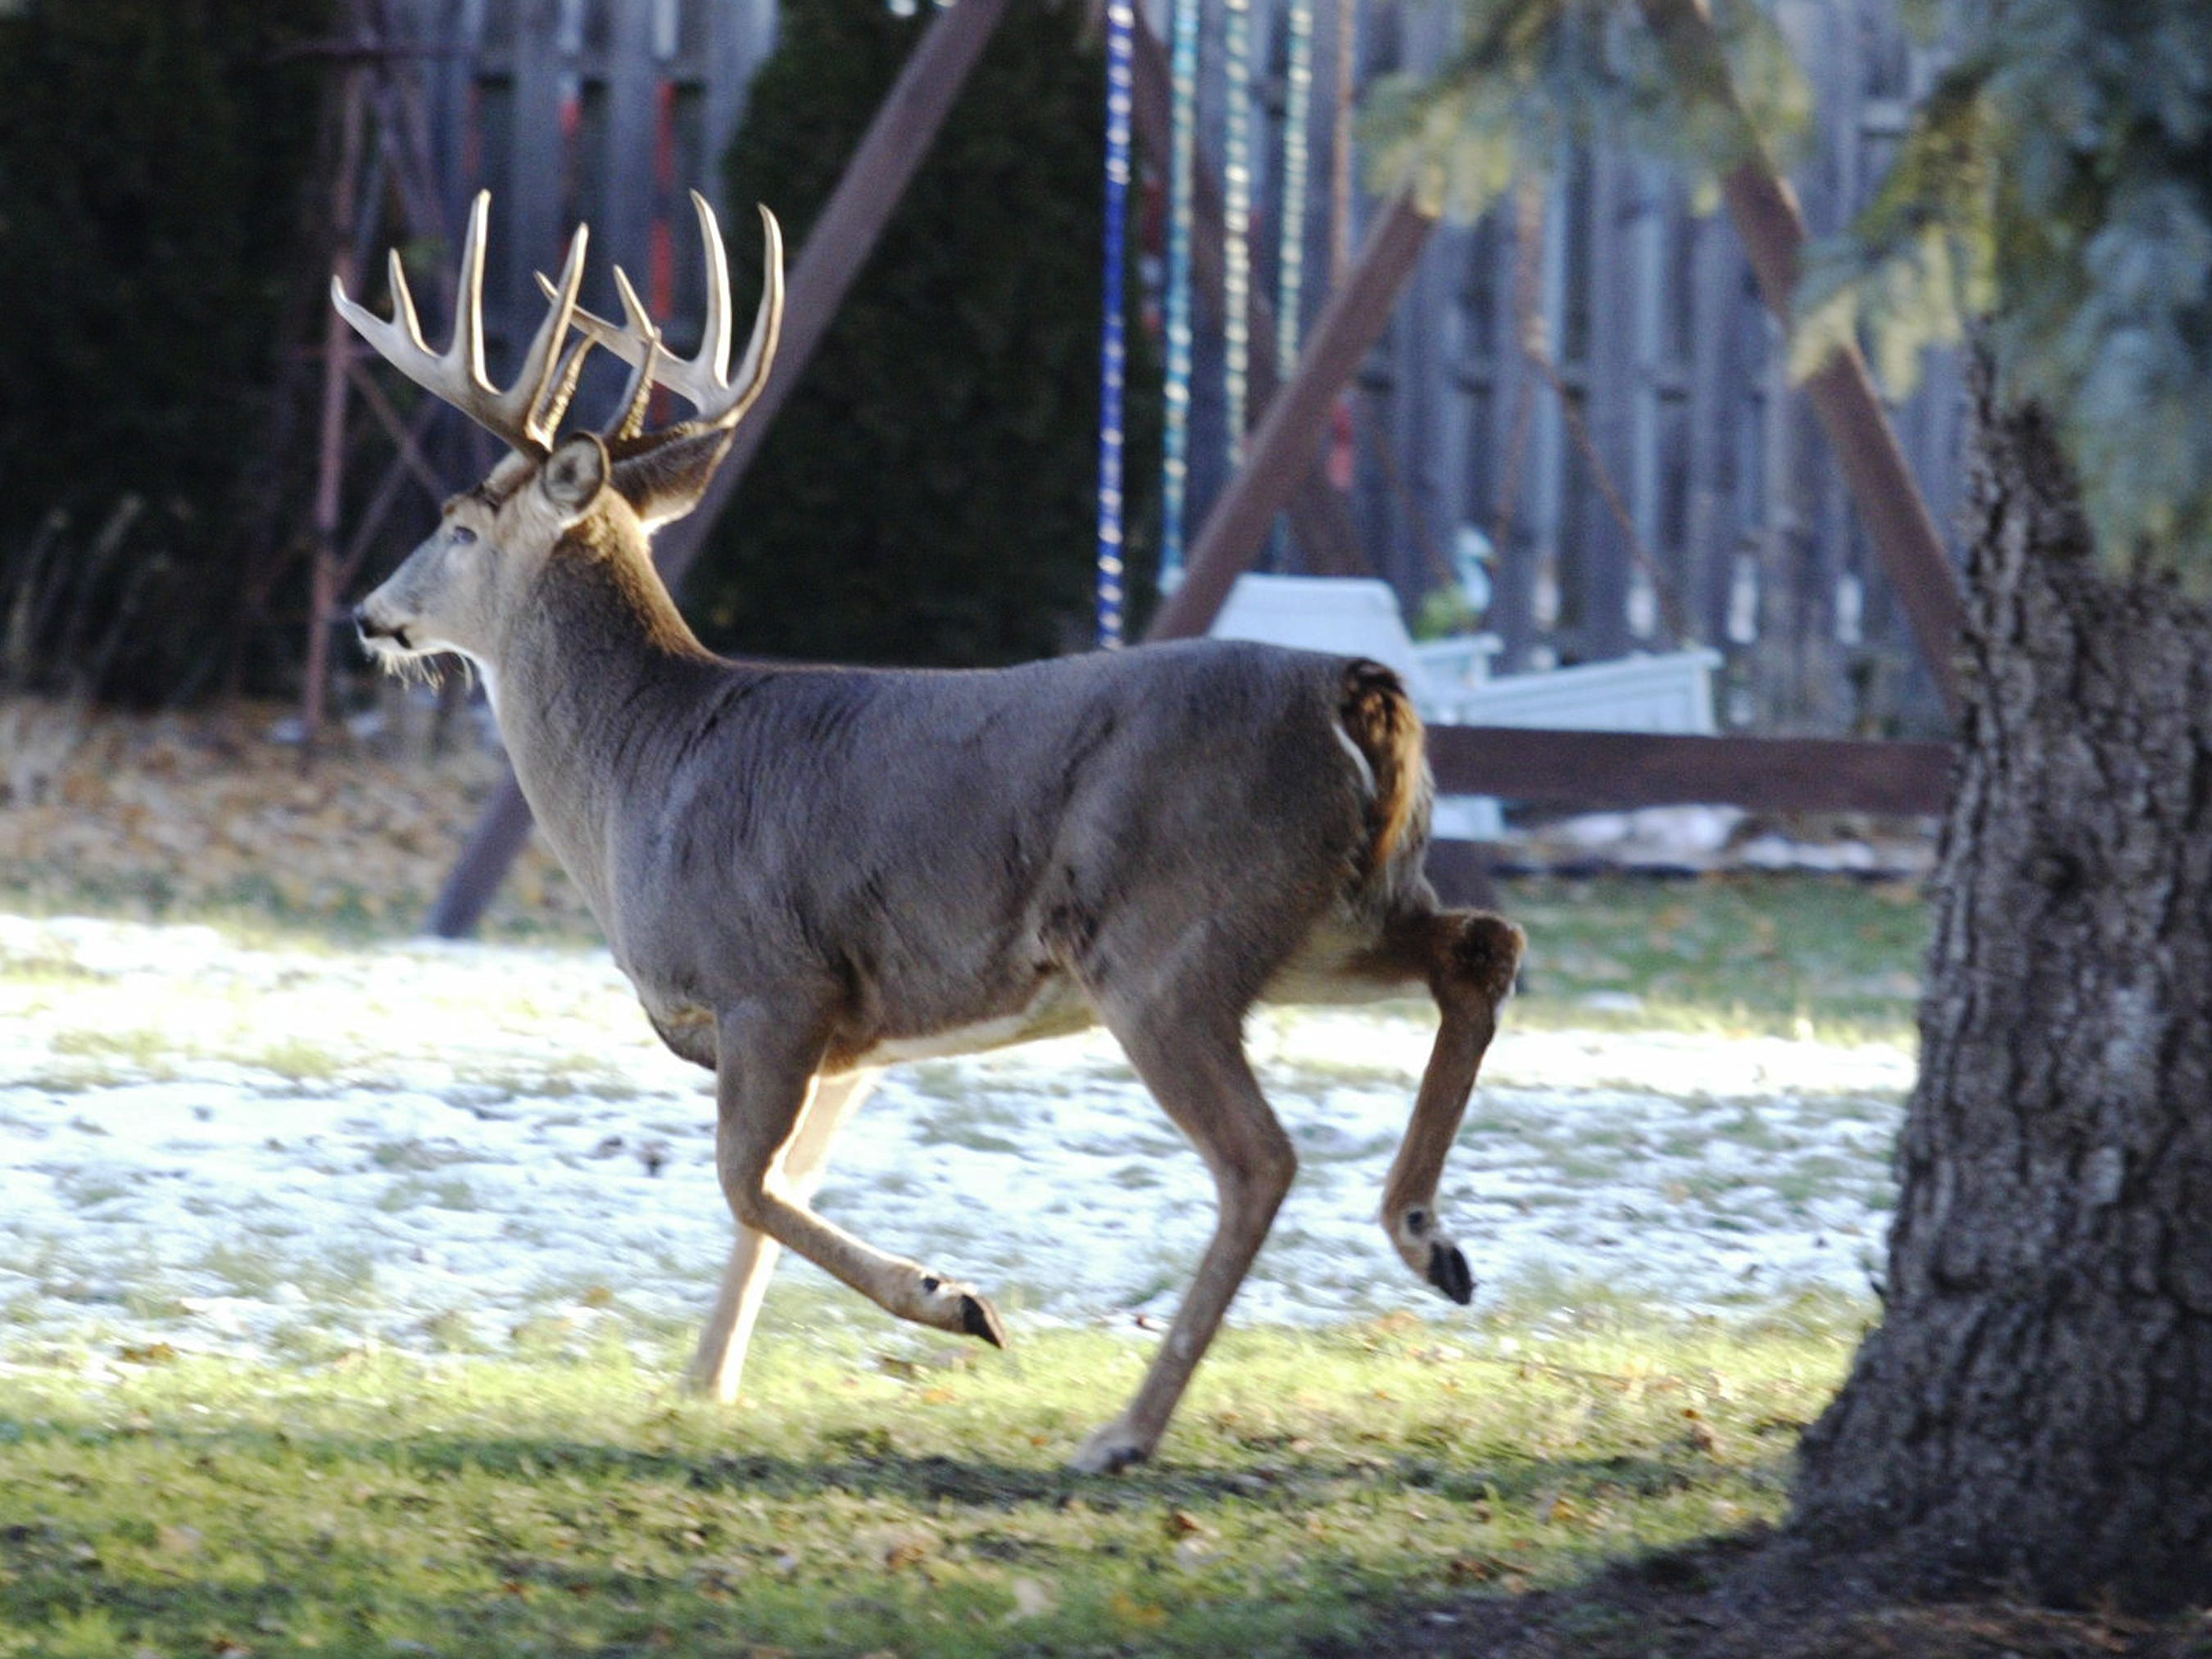 A buck prances in the backyard of a Sheboygan home in the 1000 block of N. 23rd Street, Wednesday November 14, 2018, in Sheboygan, Wis.